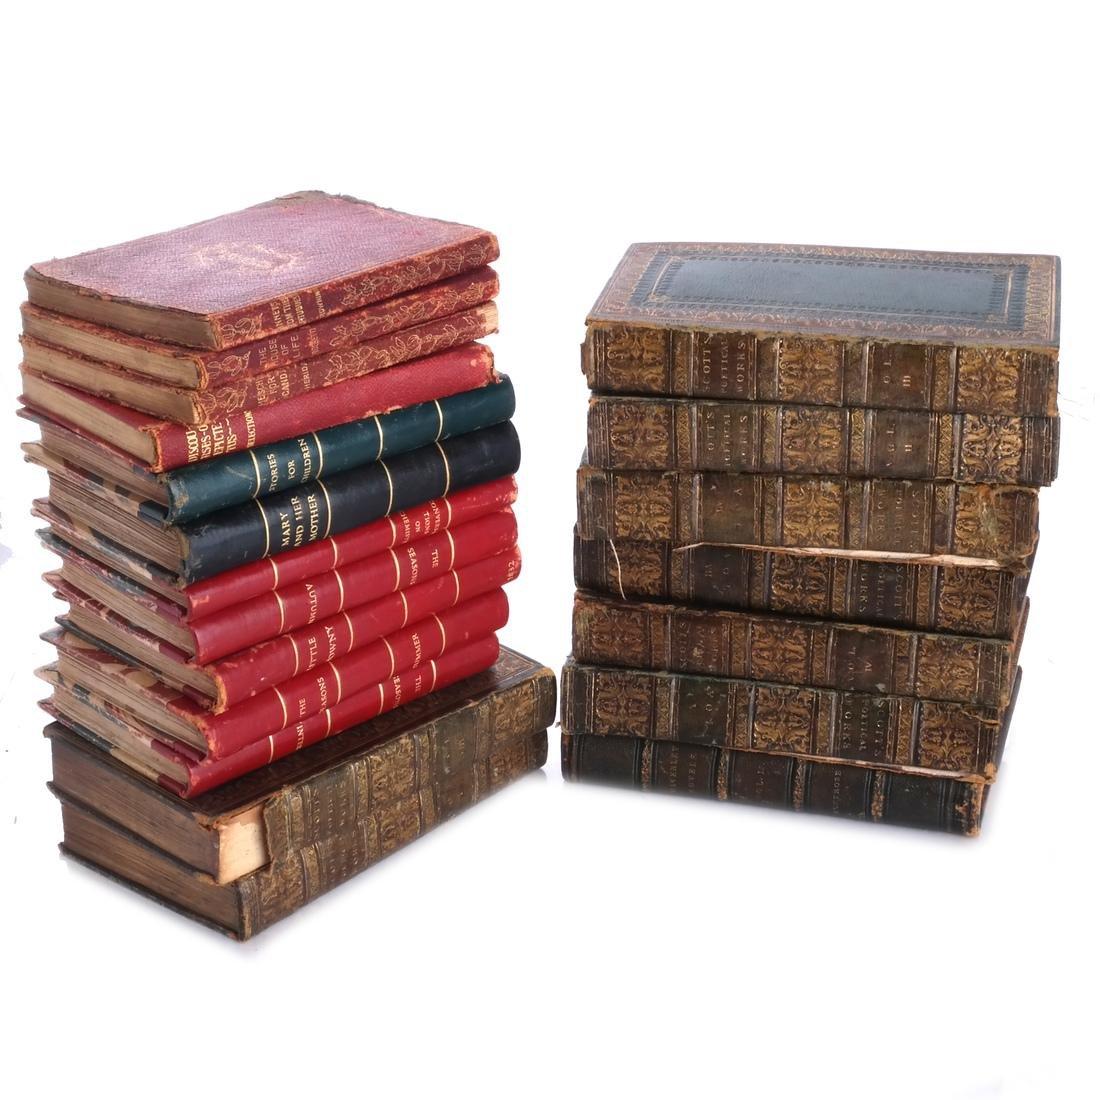 Books: 27+ Volumes - 2